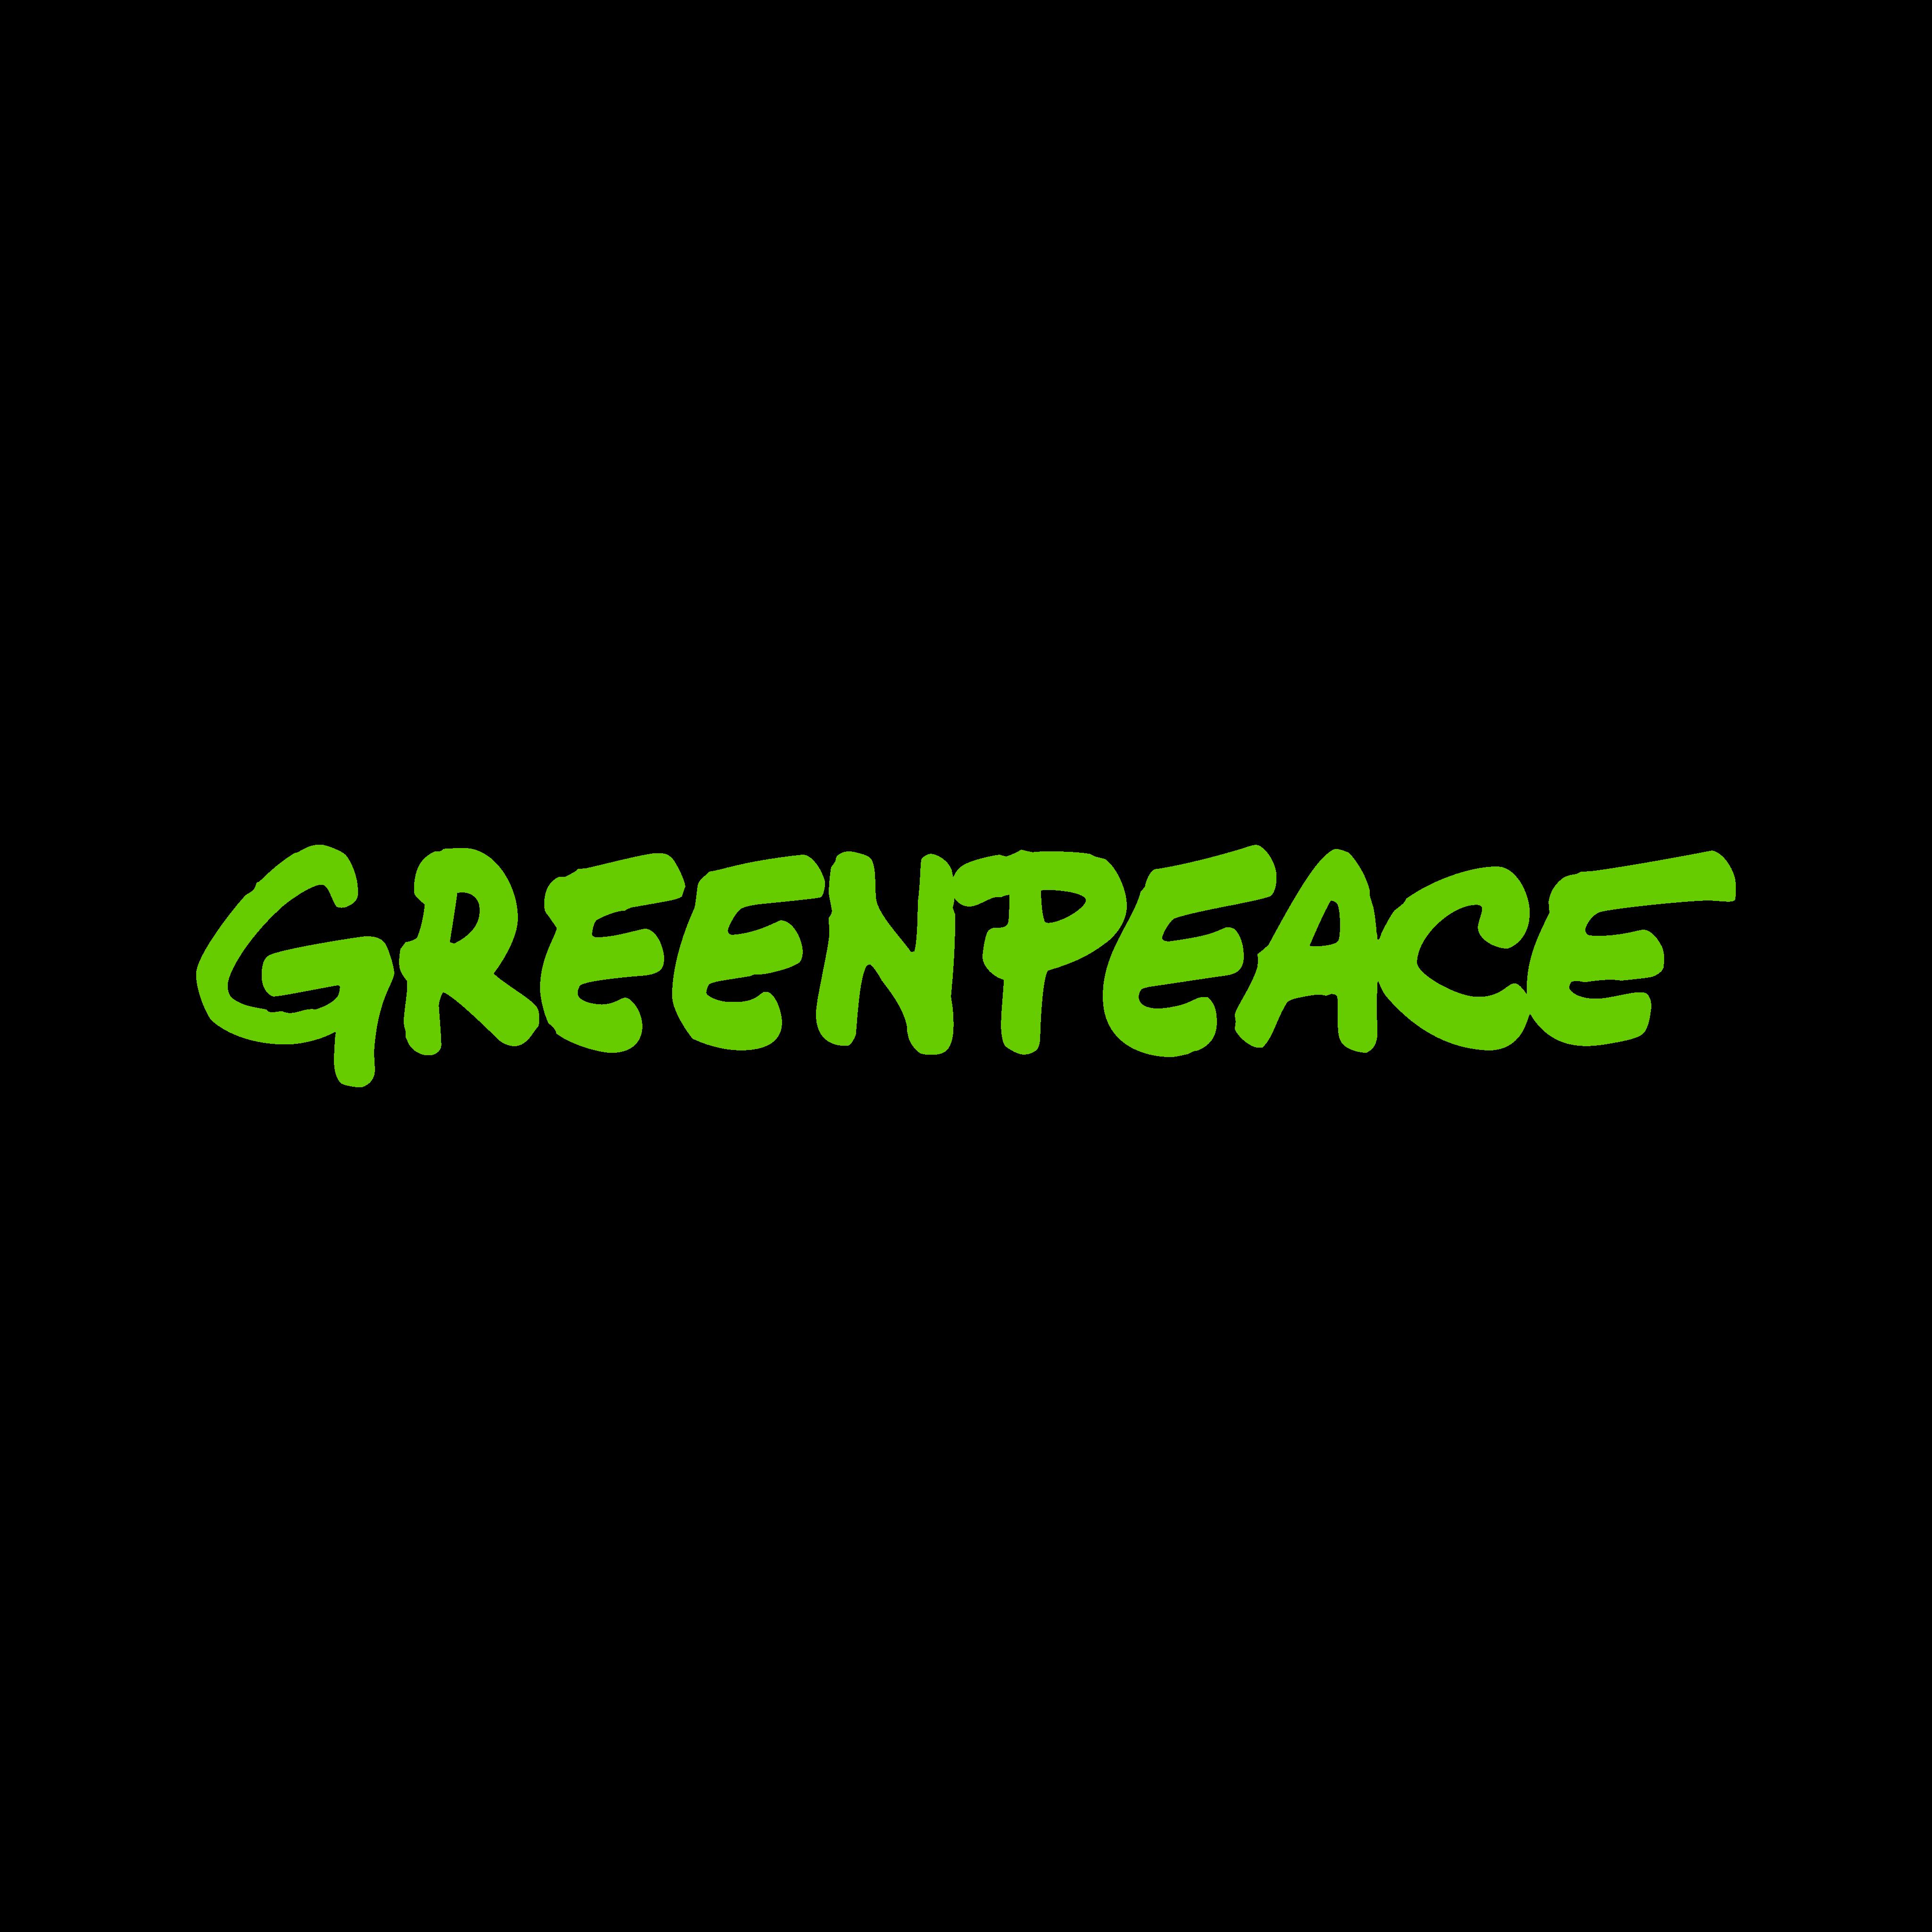 greenpeace logo 0 - Greenpeace Logo